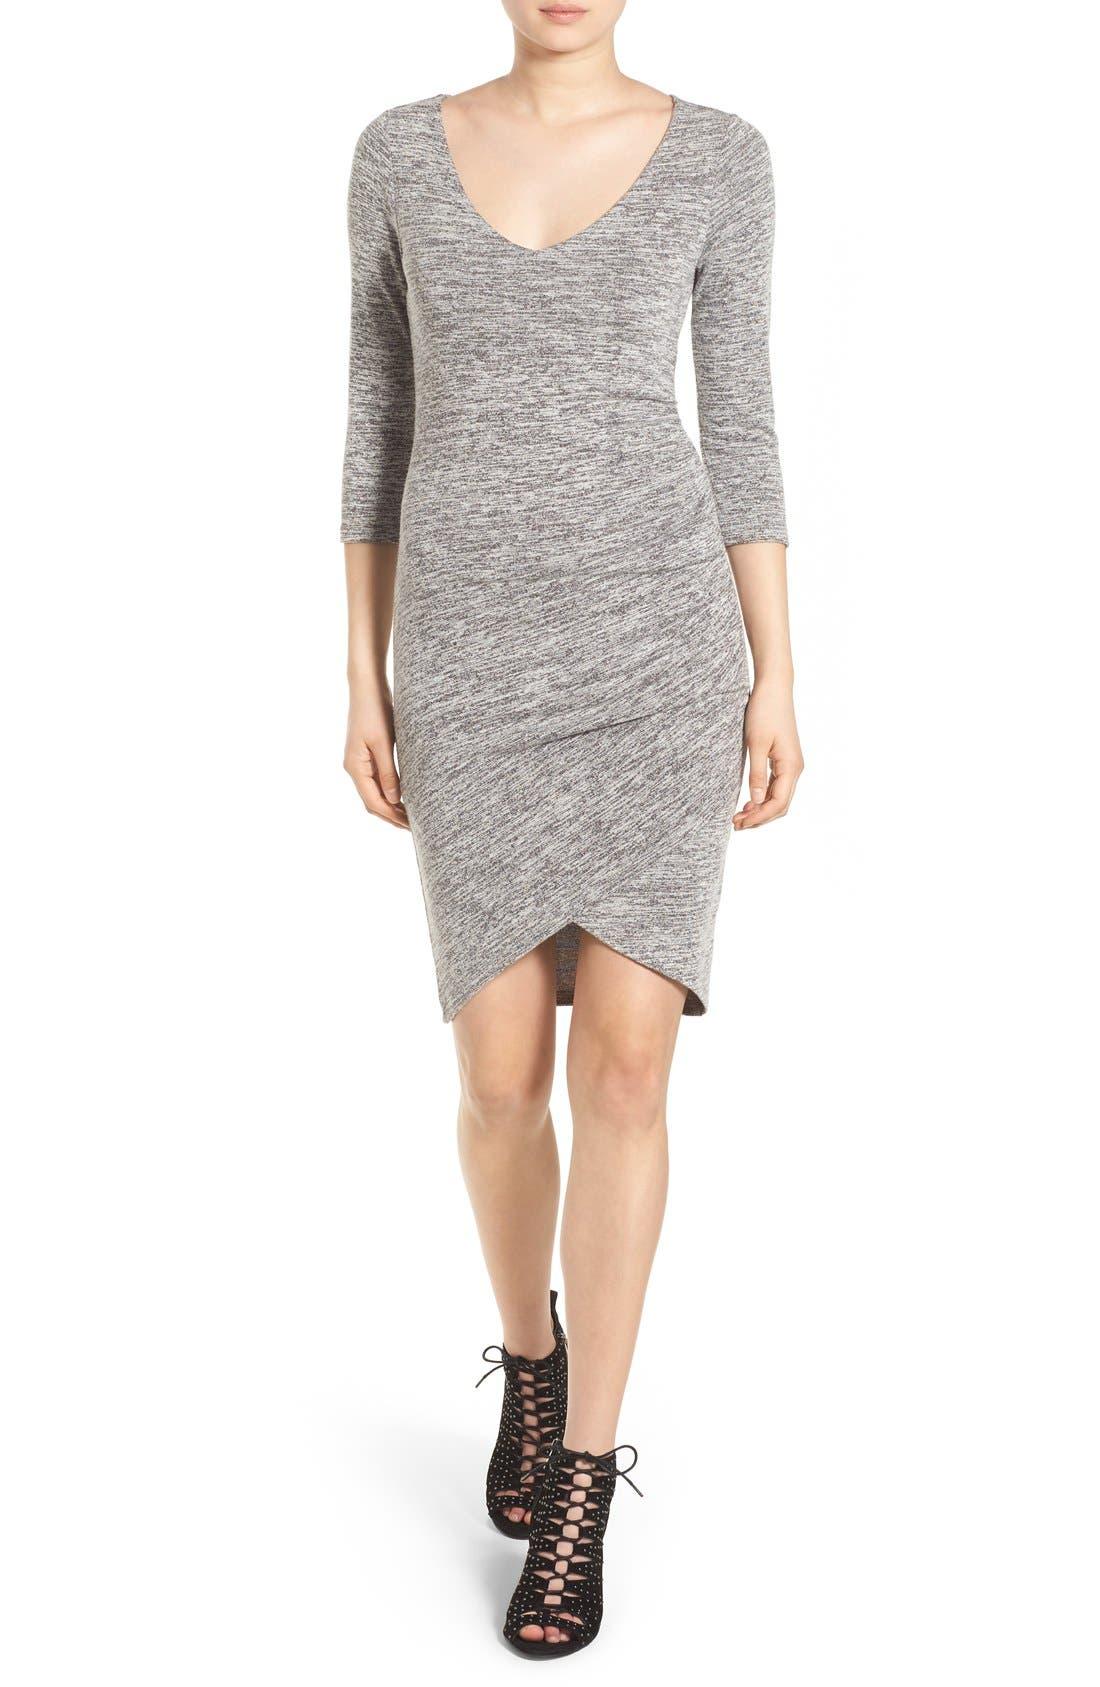 Alternate Image 1 Selected - Leith V-Neck Ruched Dress